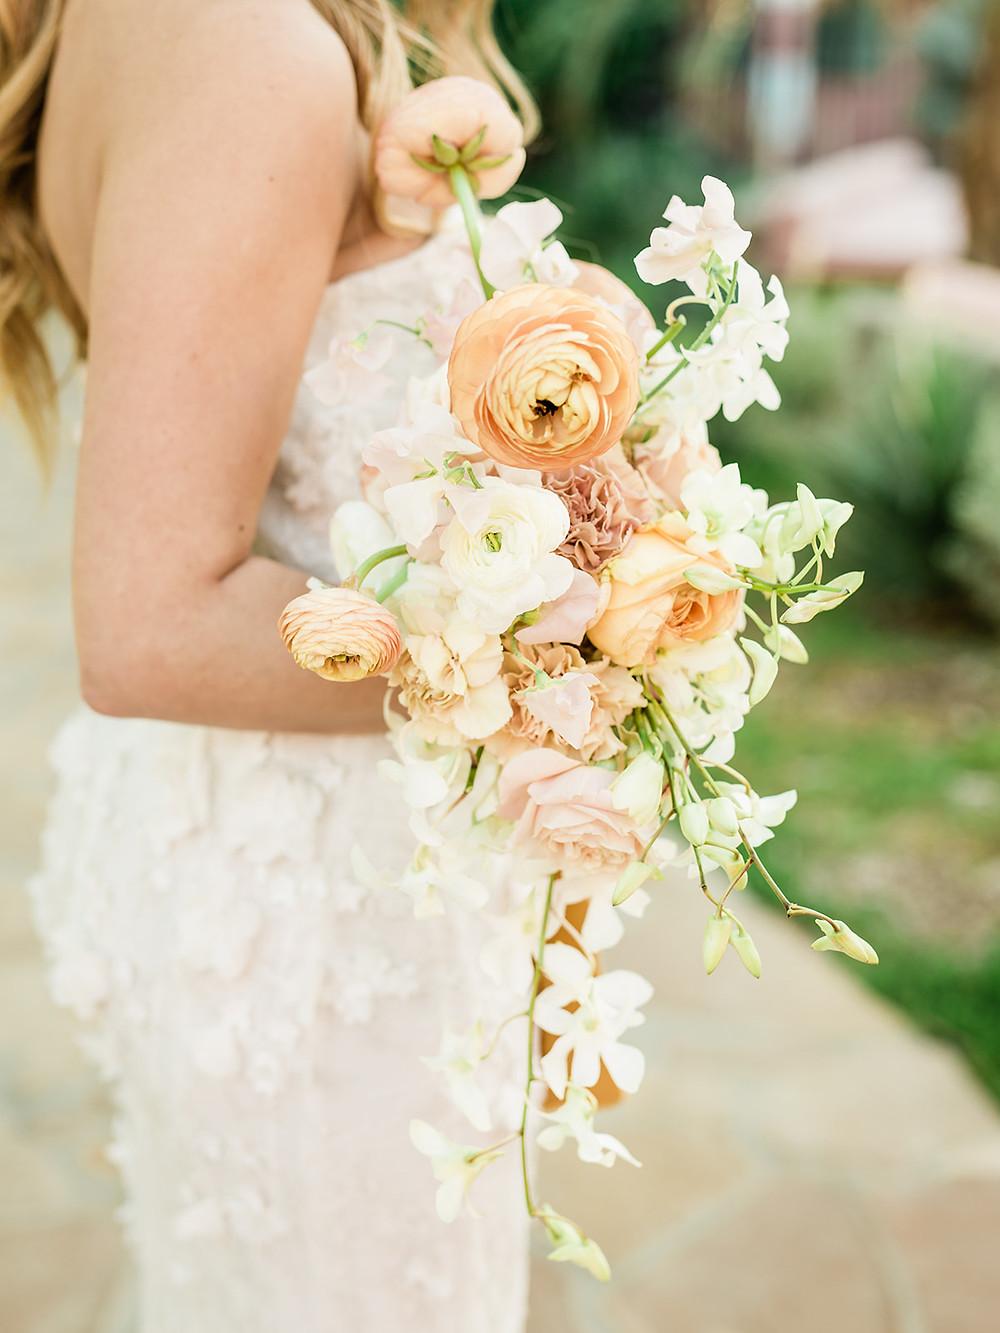 bouquet - Modern Moroccan Desert Glam Editorial - LGBTQ Wedding Editoiral - Wedding Design Inspiration - Muted Desert Tones - Modern Glam Jungle Chic